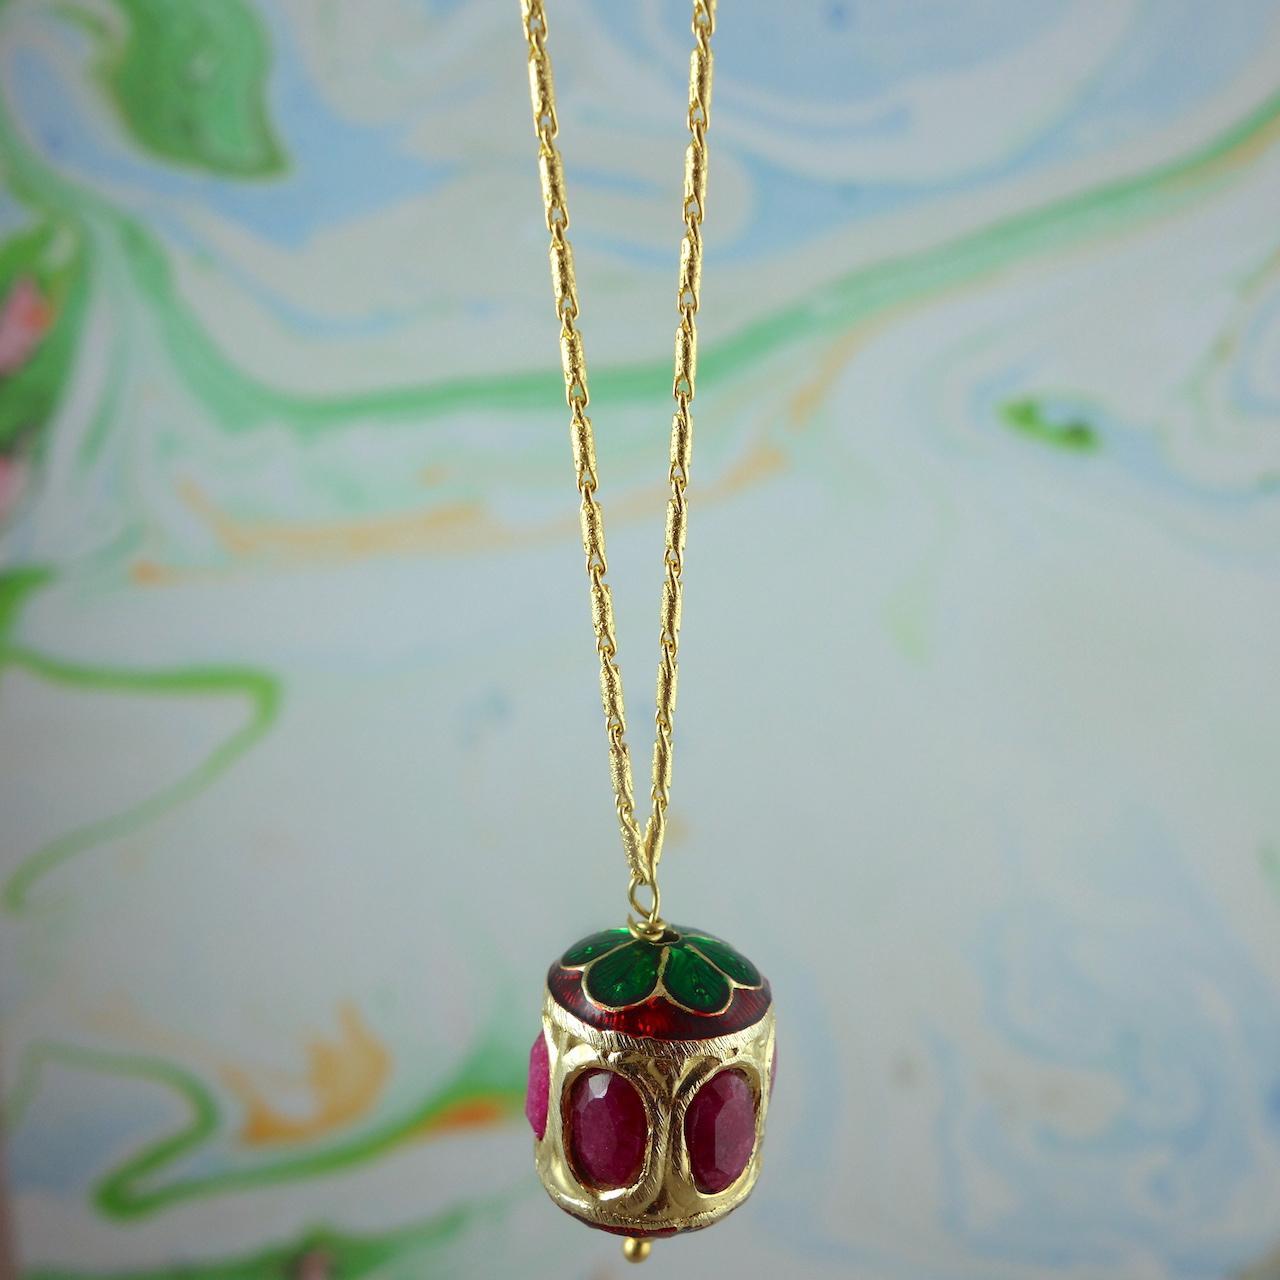 collier-shalimar-roulotte-boheme-voyageur-dore-or-fin-perle-indienne-vintage